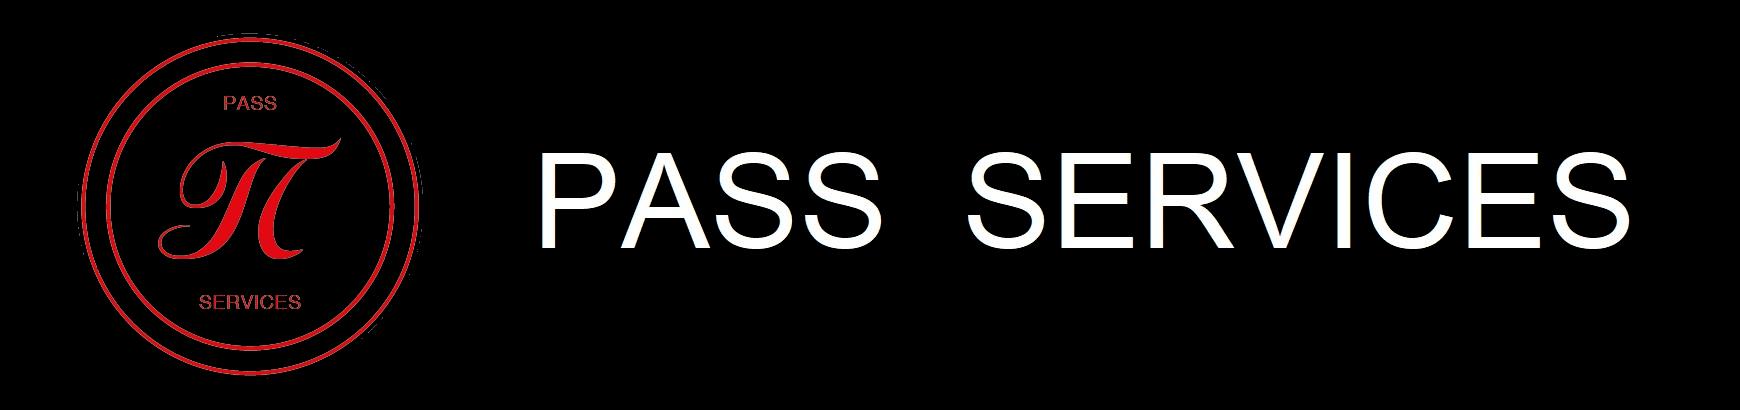 Pass Services